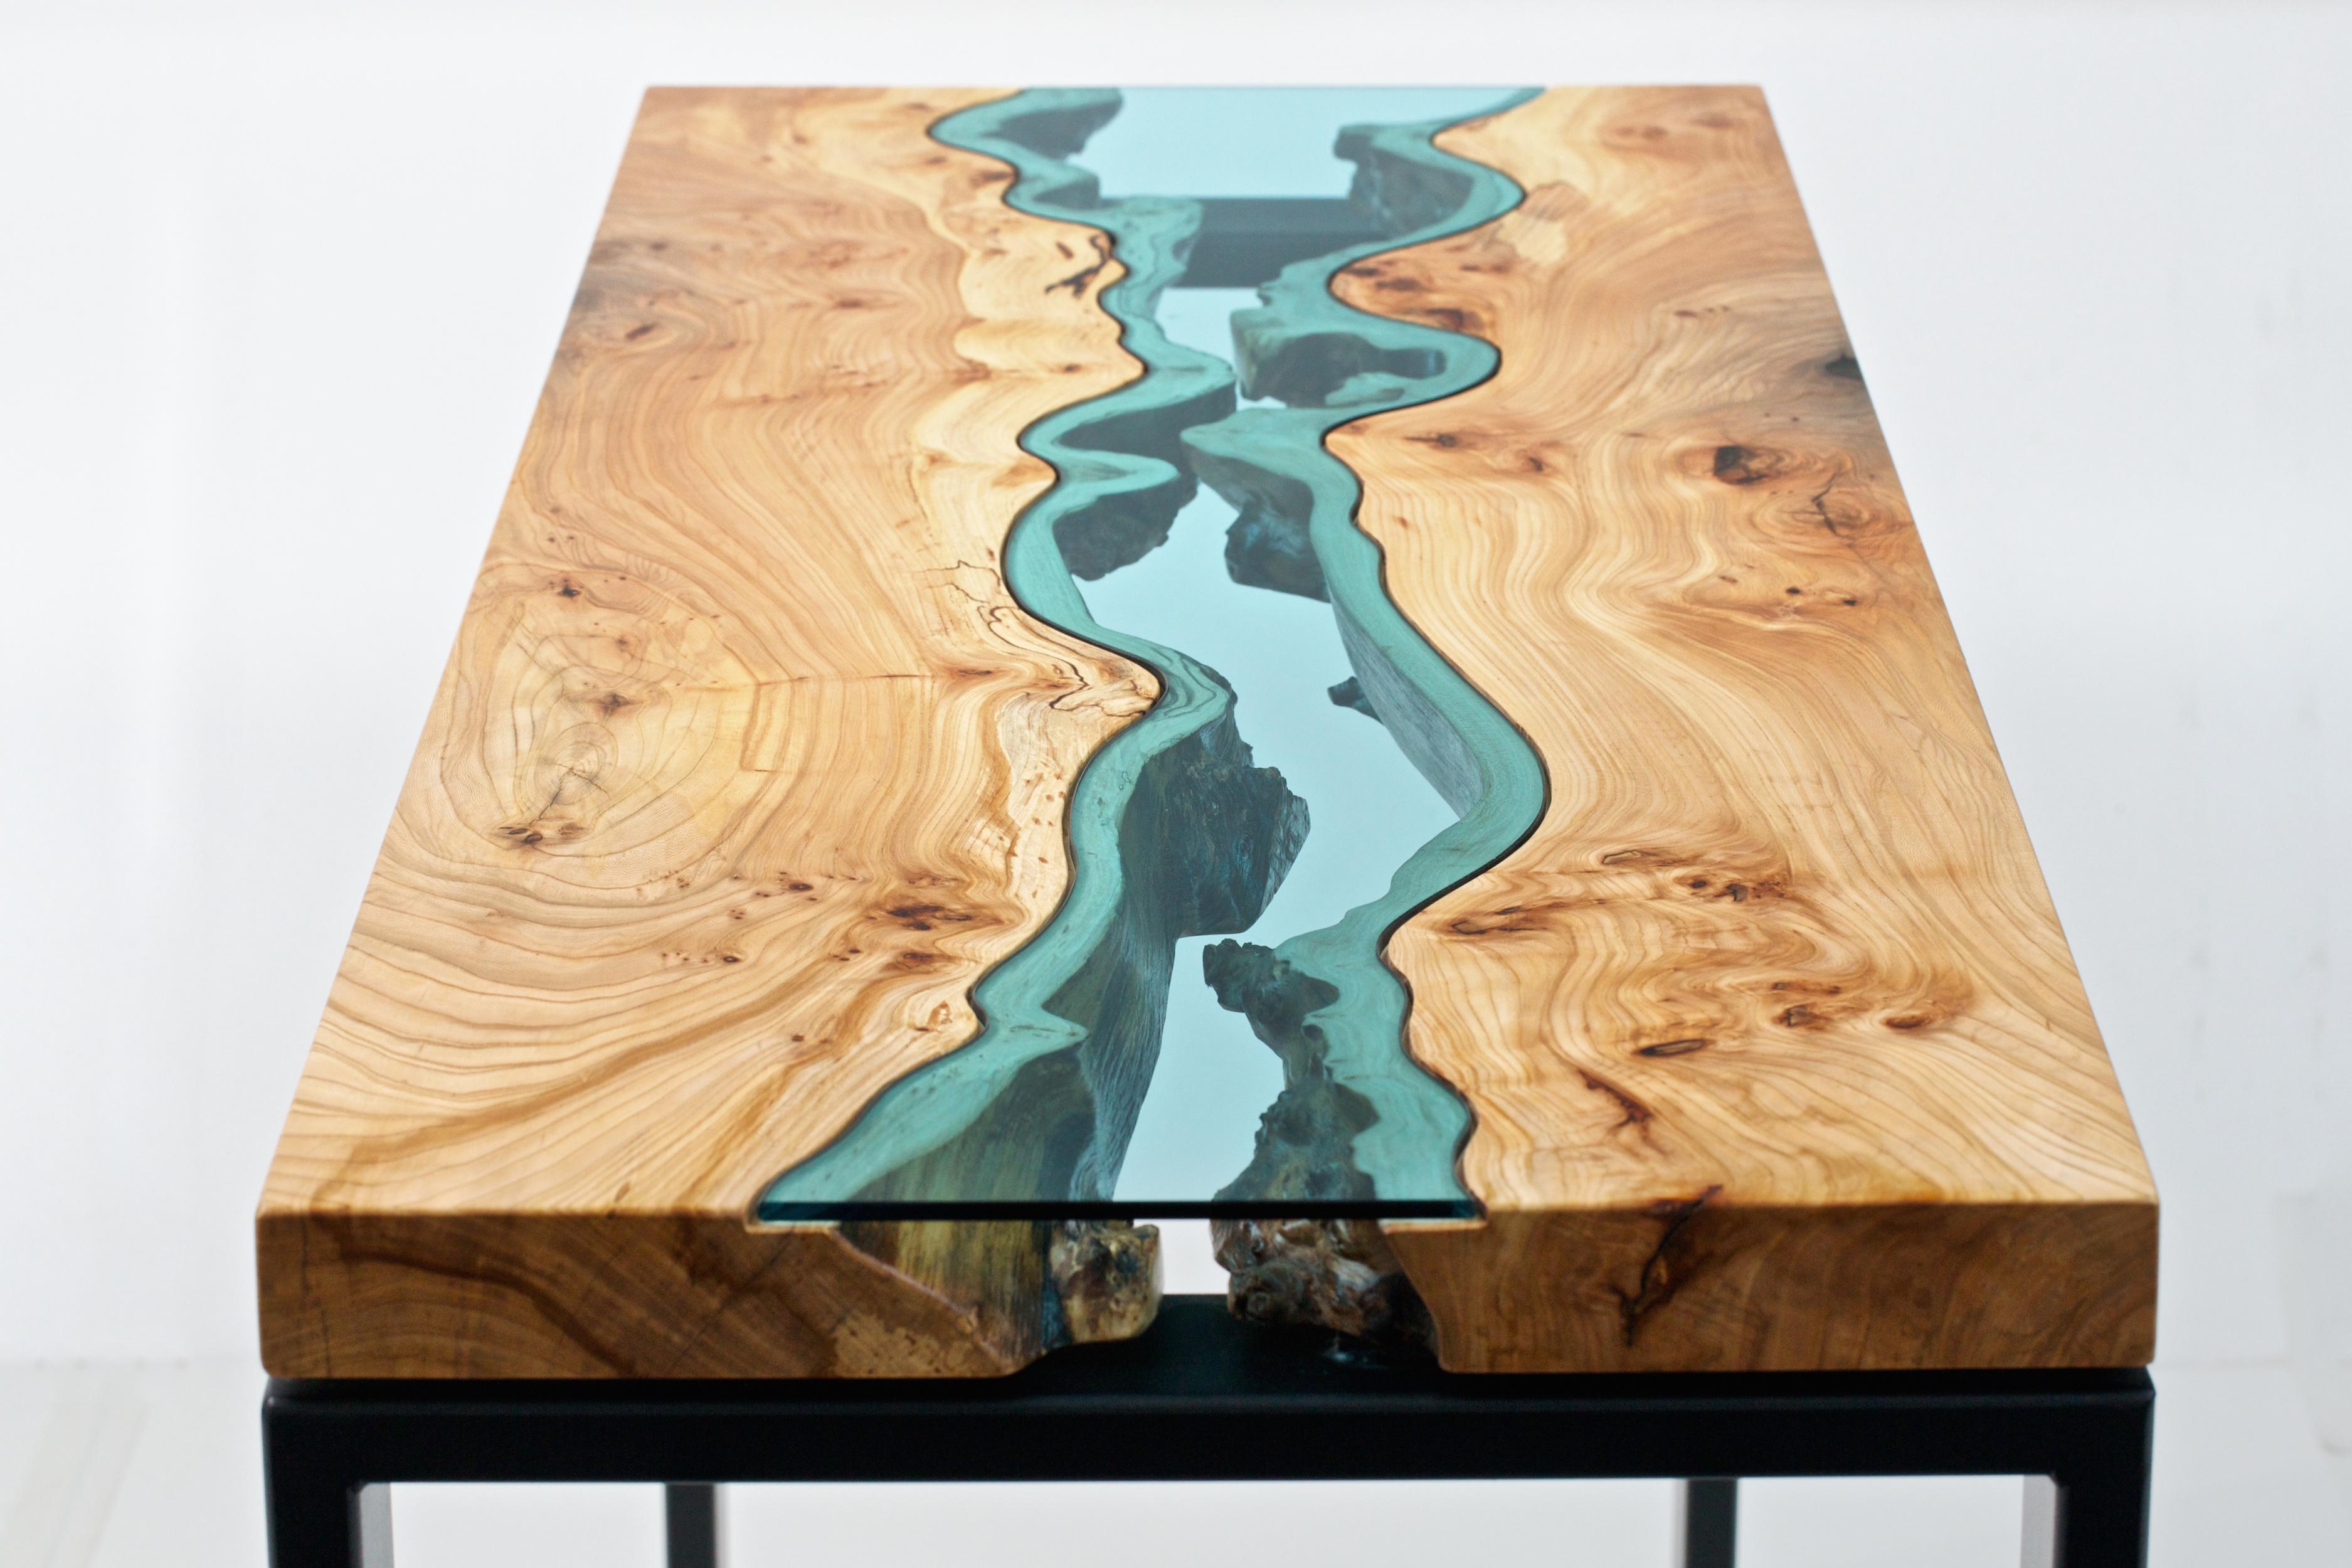 Elm River Table.Greg Klassen - Greg Klassen